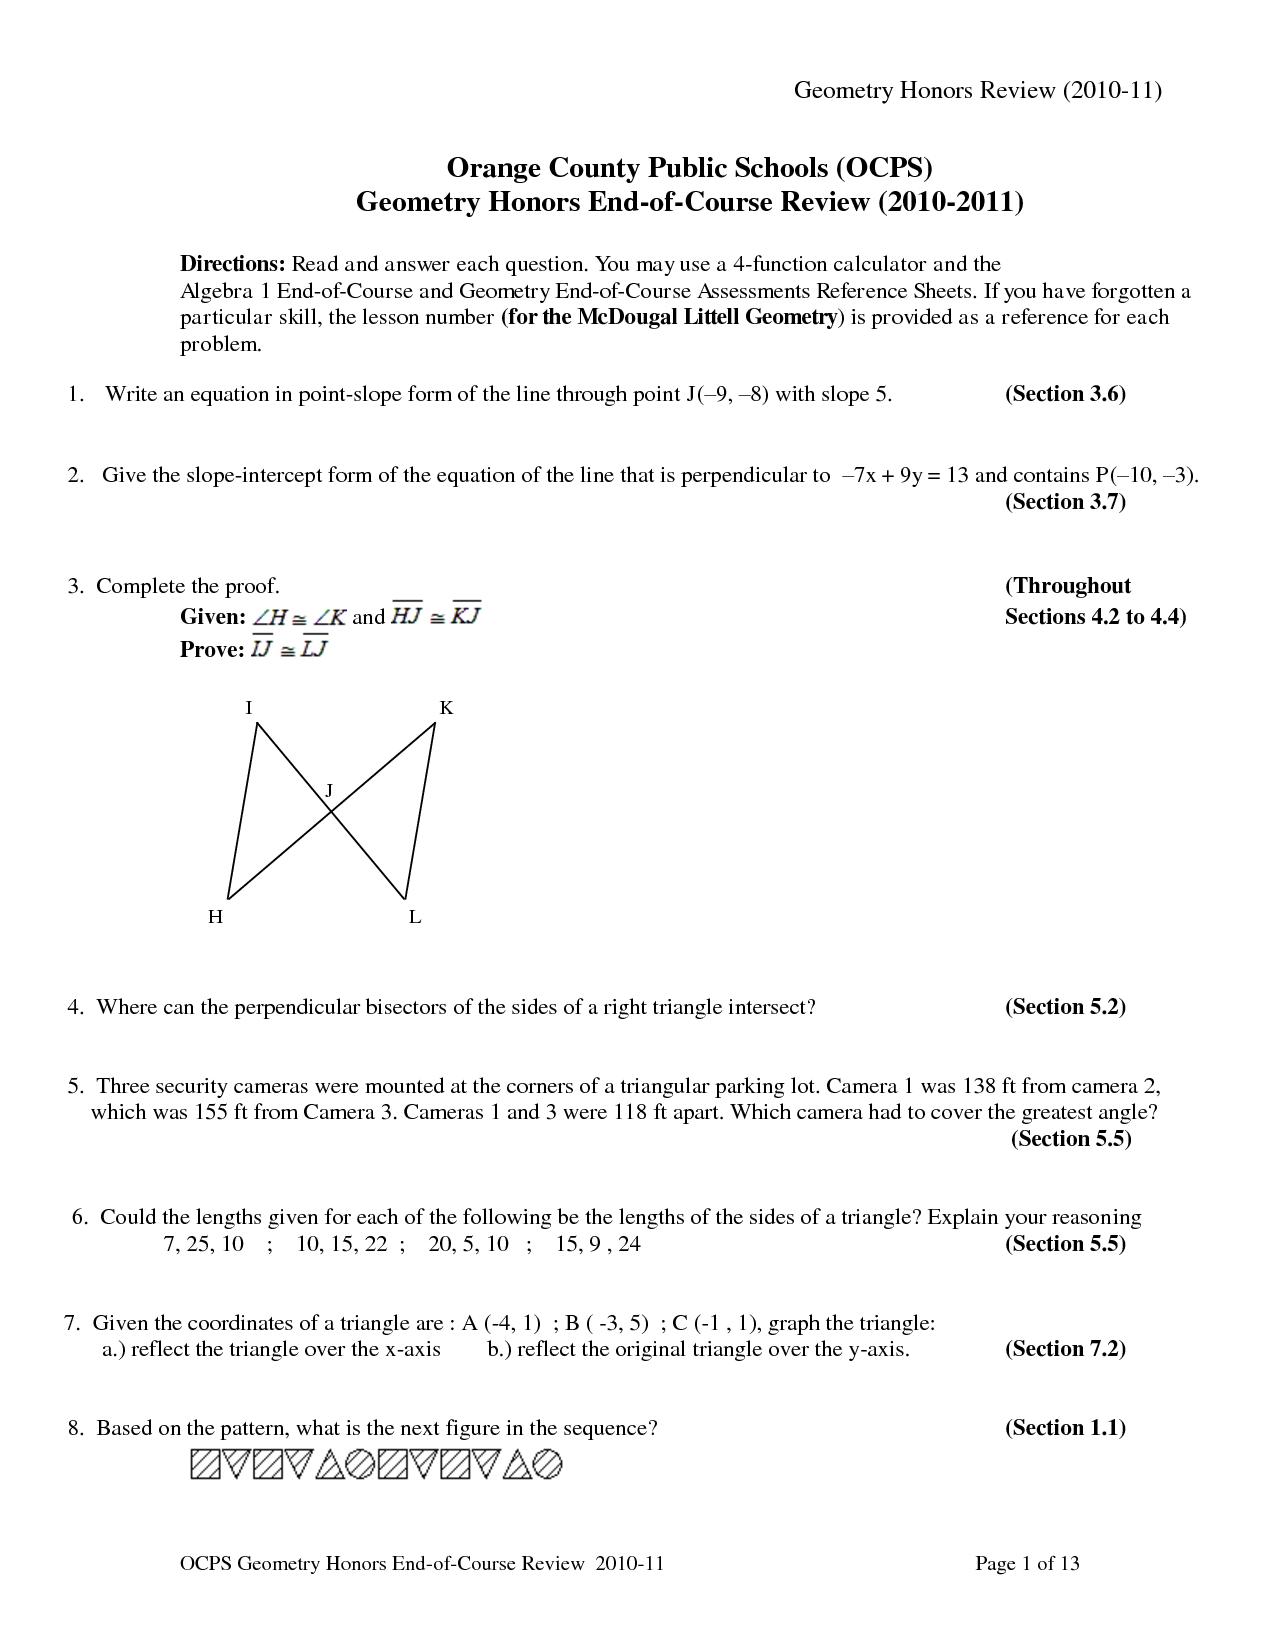 Holt Mcdougal Worksheet Answers - Worksheet List